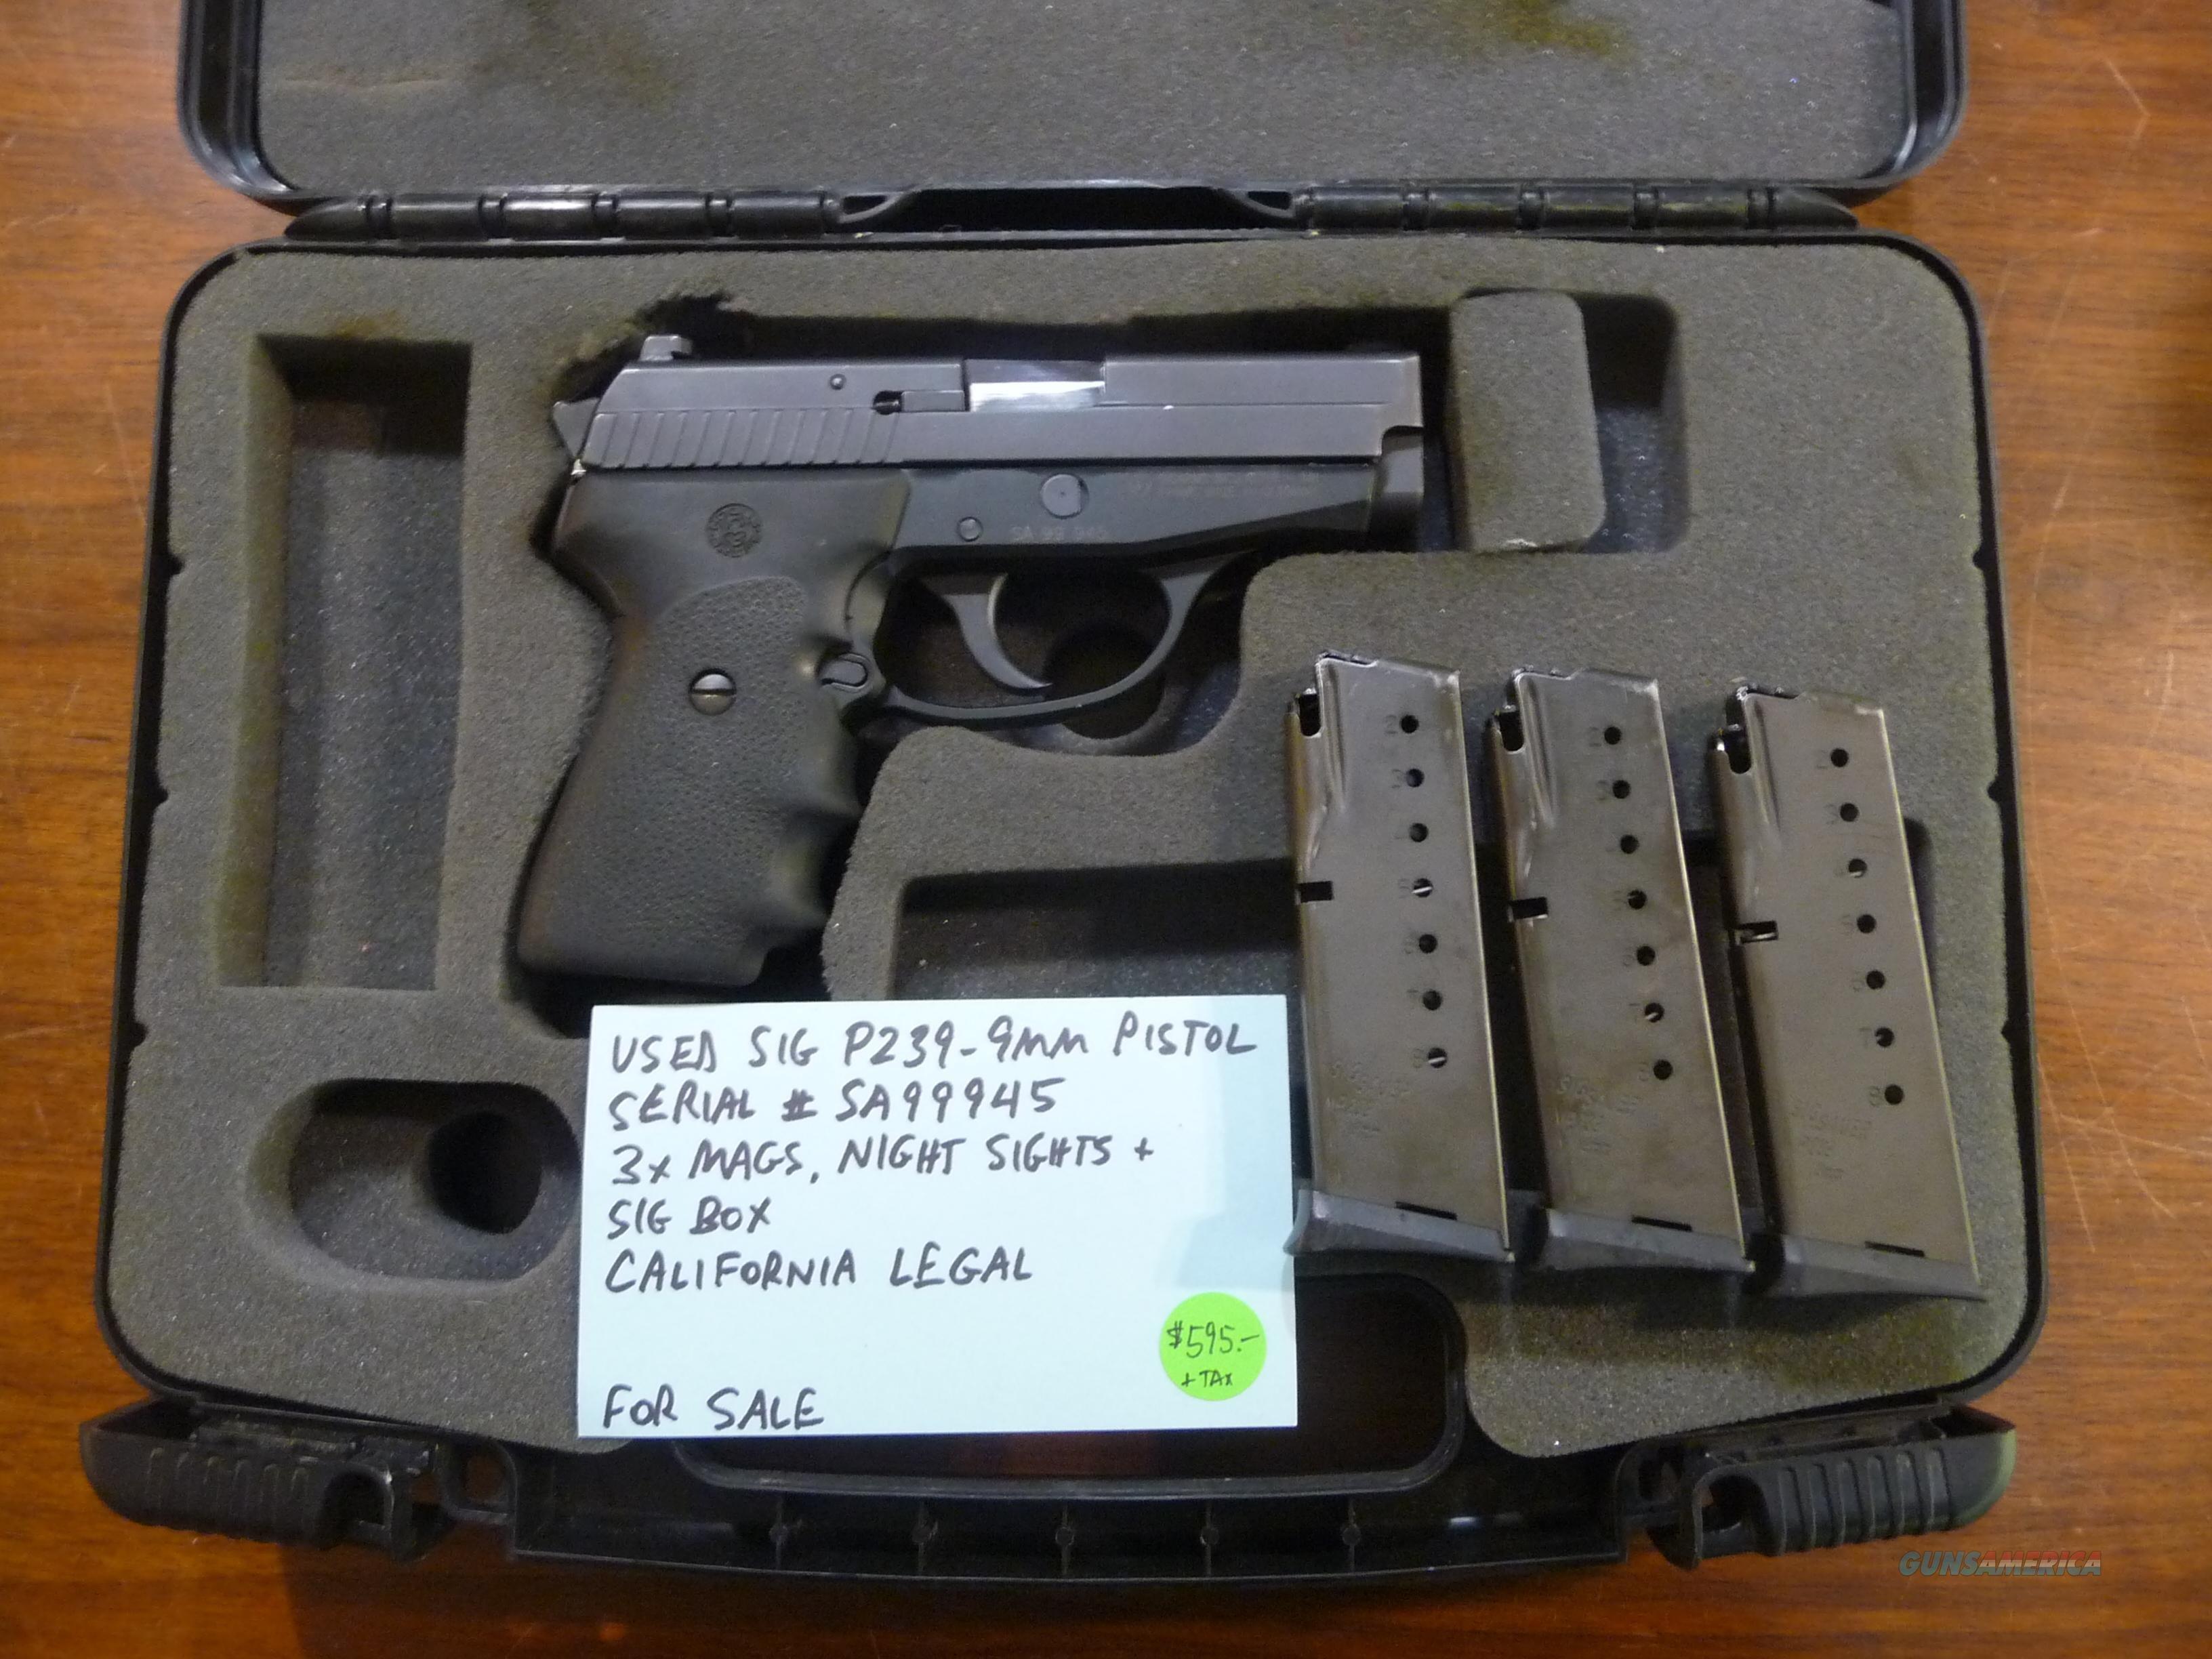 california legal 9mm sig p239 pistol box sauer guns pistols userimages